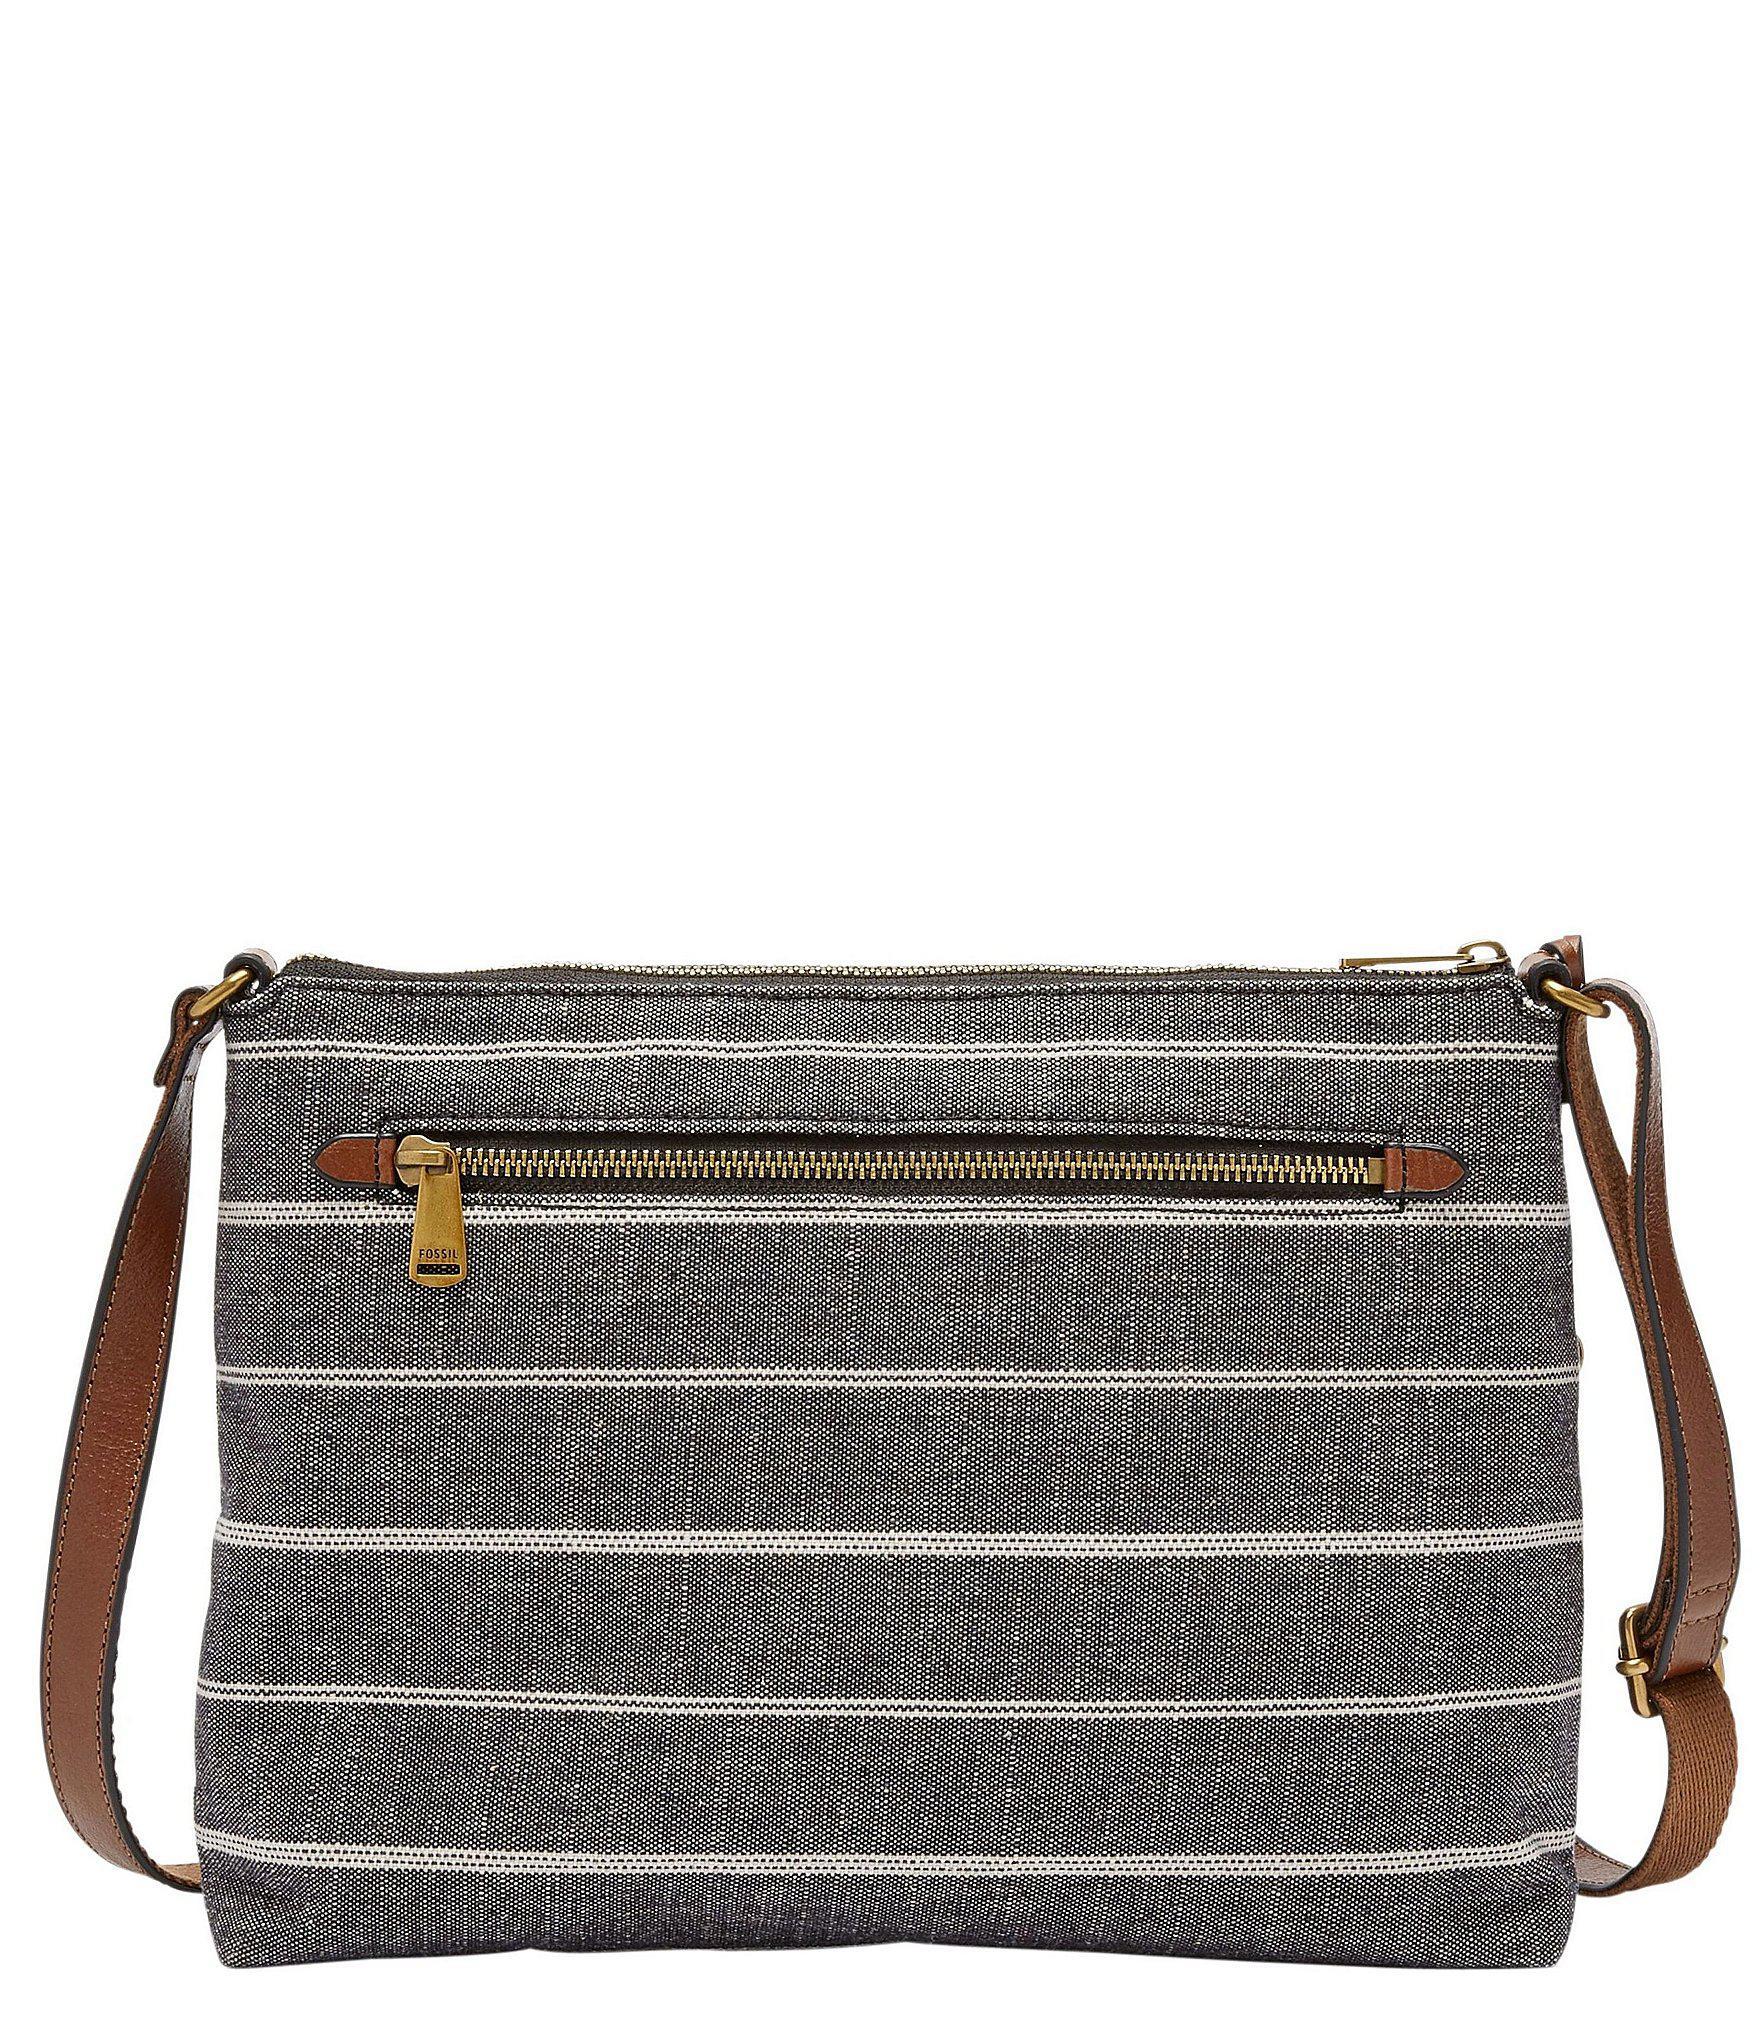 Fossil - Gray Kinley Striped Cross-body Colorblock Bag - Lyst. View  fullscreen 4e98fa6ef75c5